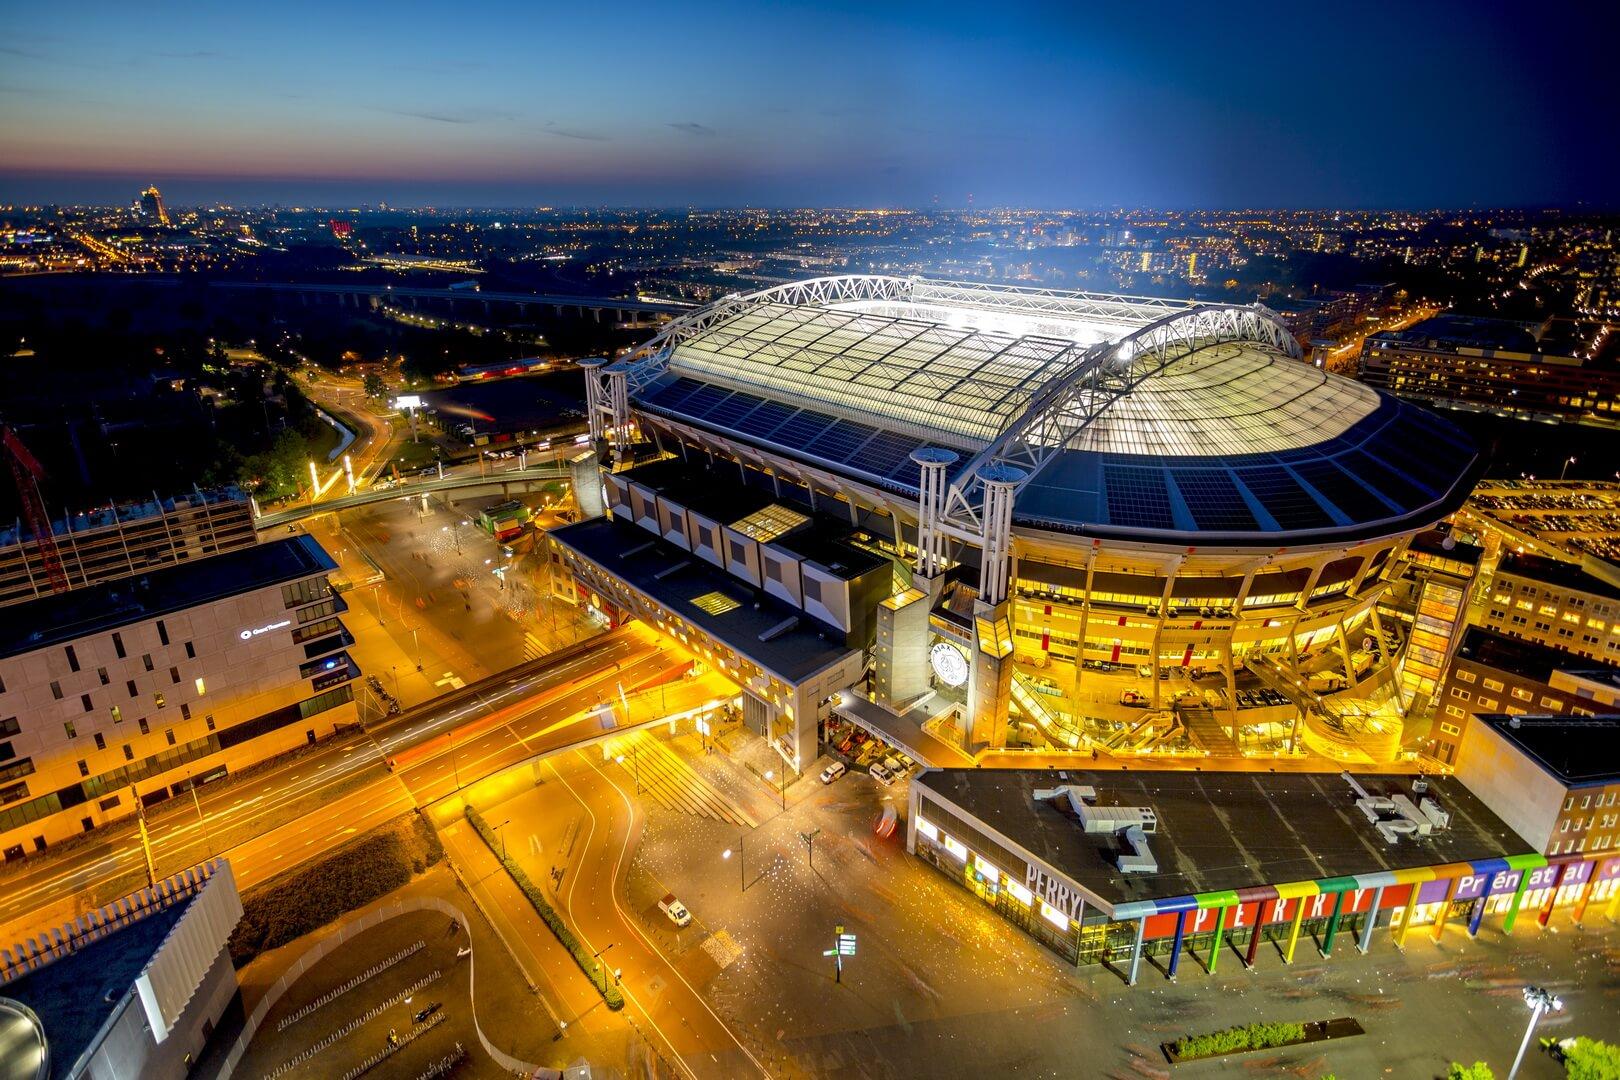 Стадион в Амстердаме запитали от аккумуляторных батарей Nissan Leaf